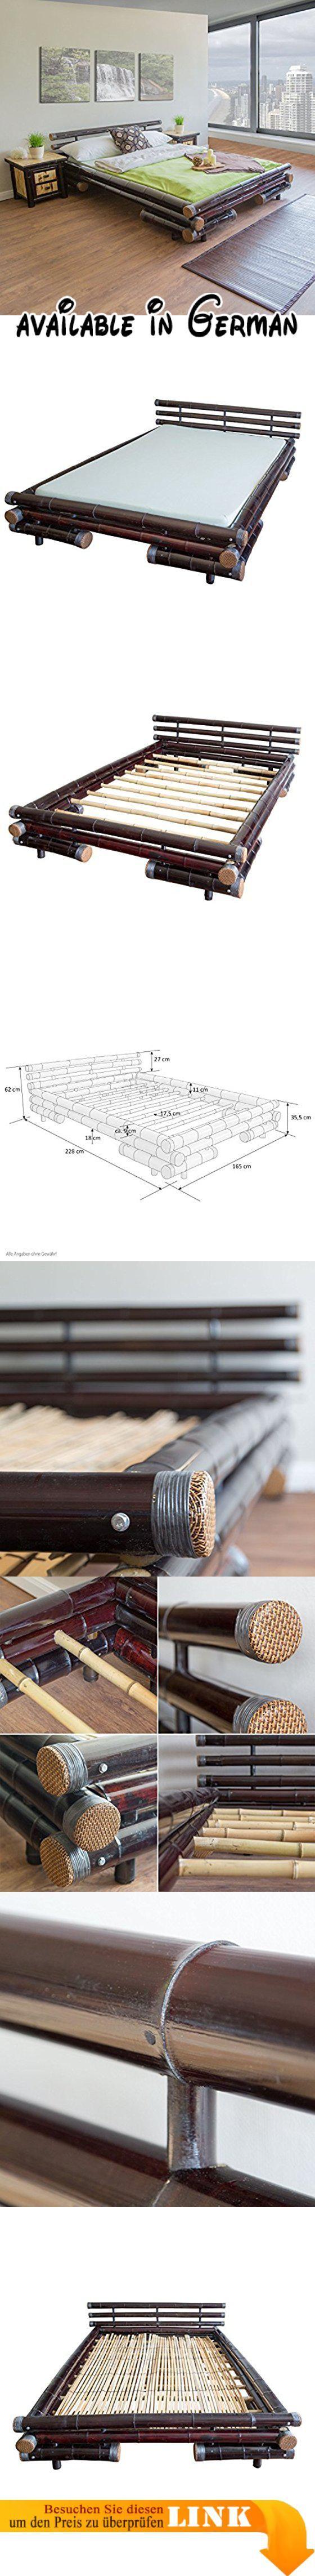 B00KFBLZ62 : Homestyle4u Bambusbett Futonbett Bambus Bett 160 x 200 ...